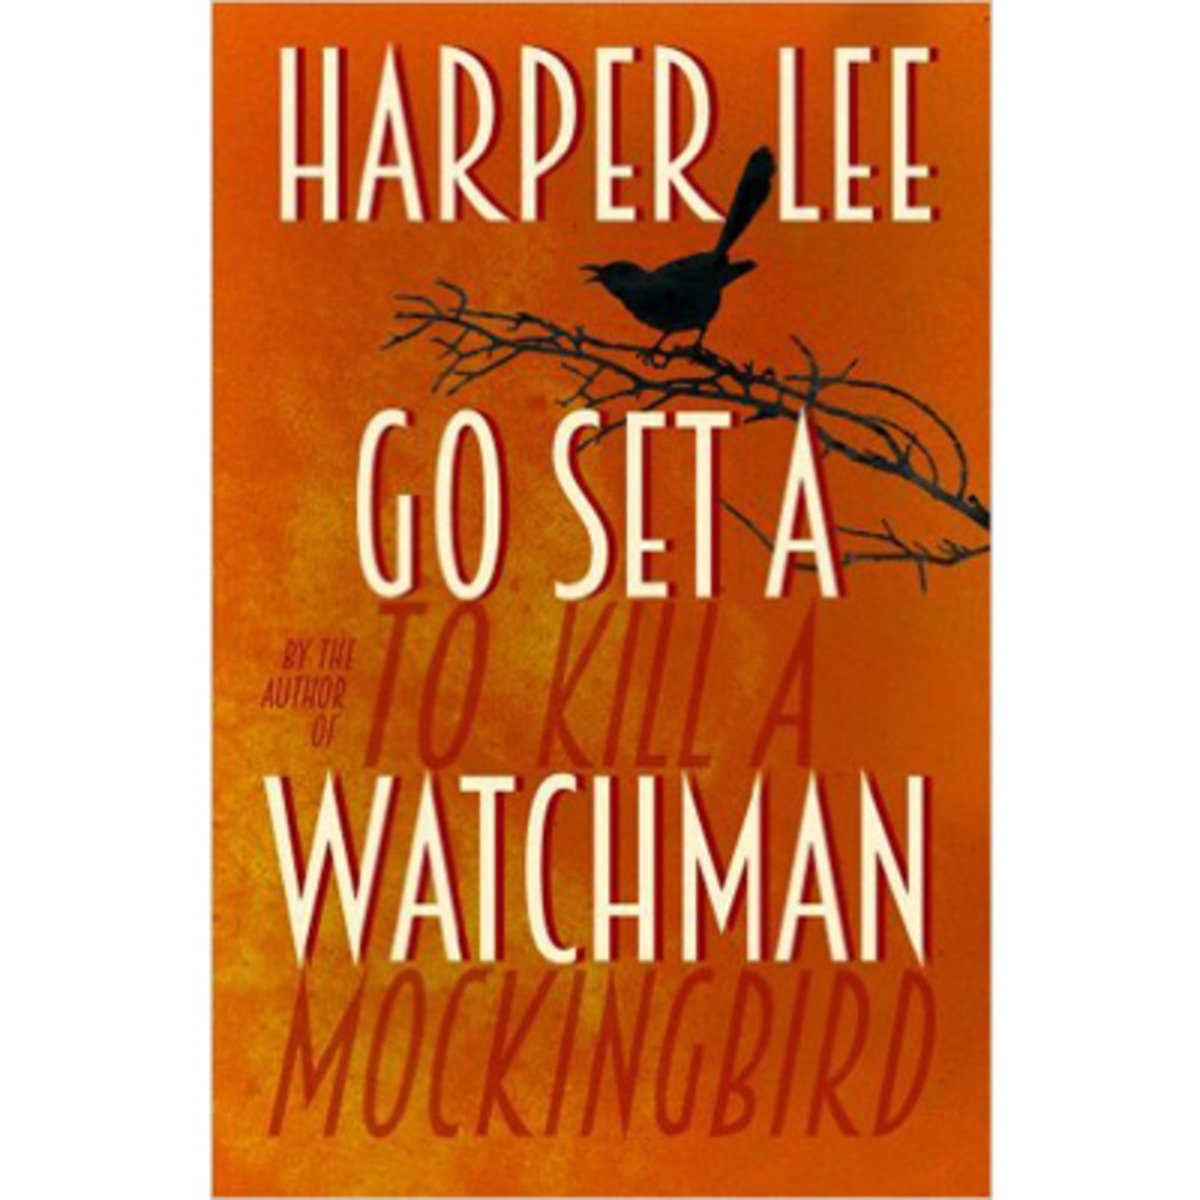 GO SET A WATCHMAN 9781785150289